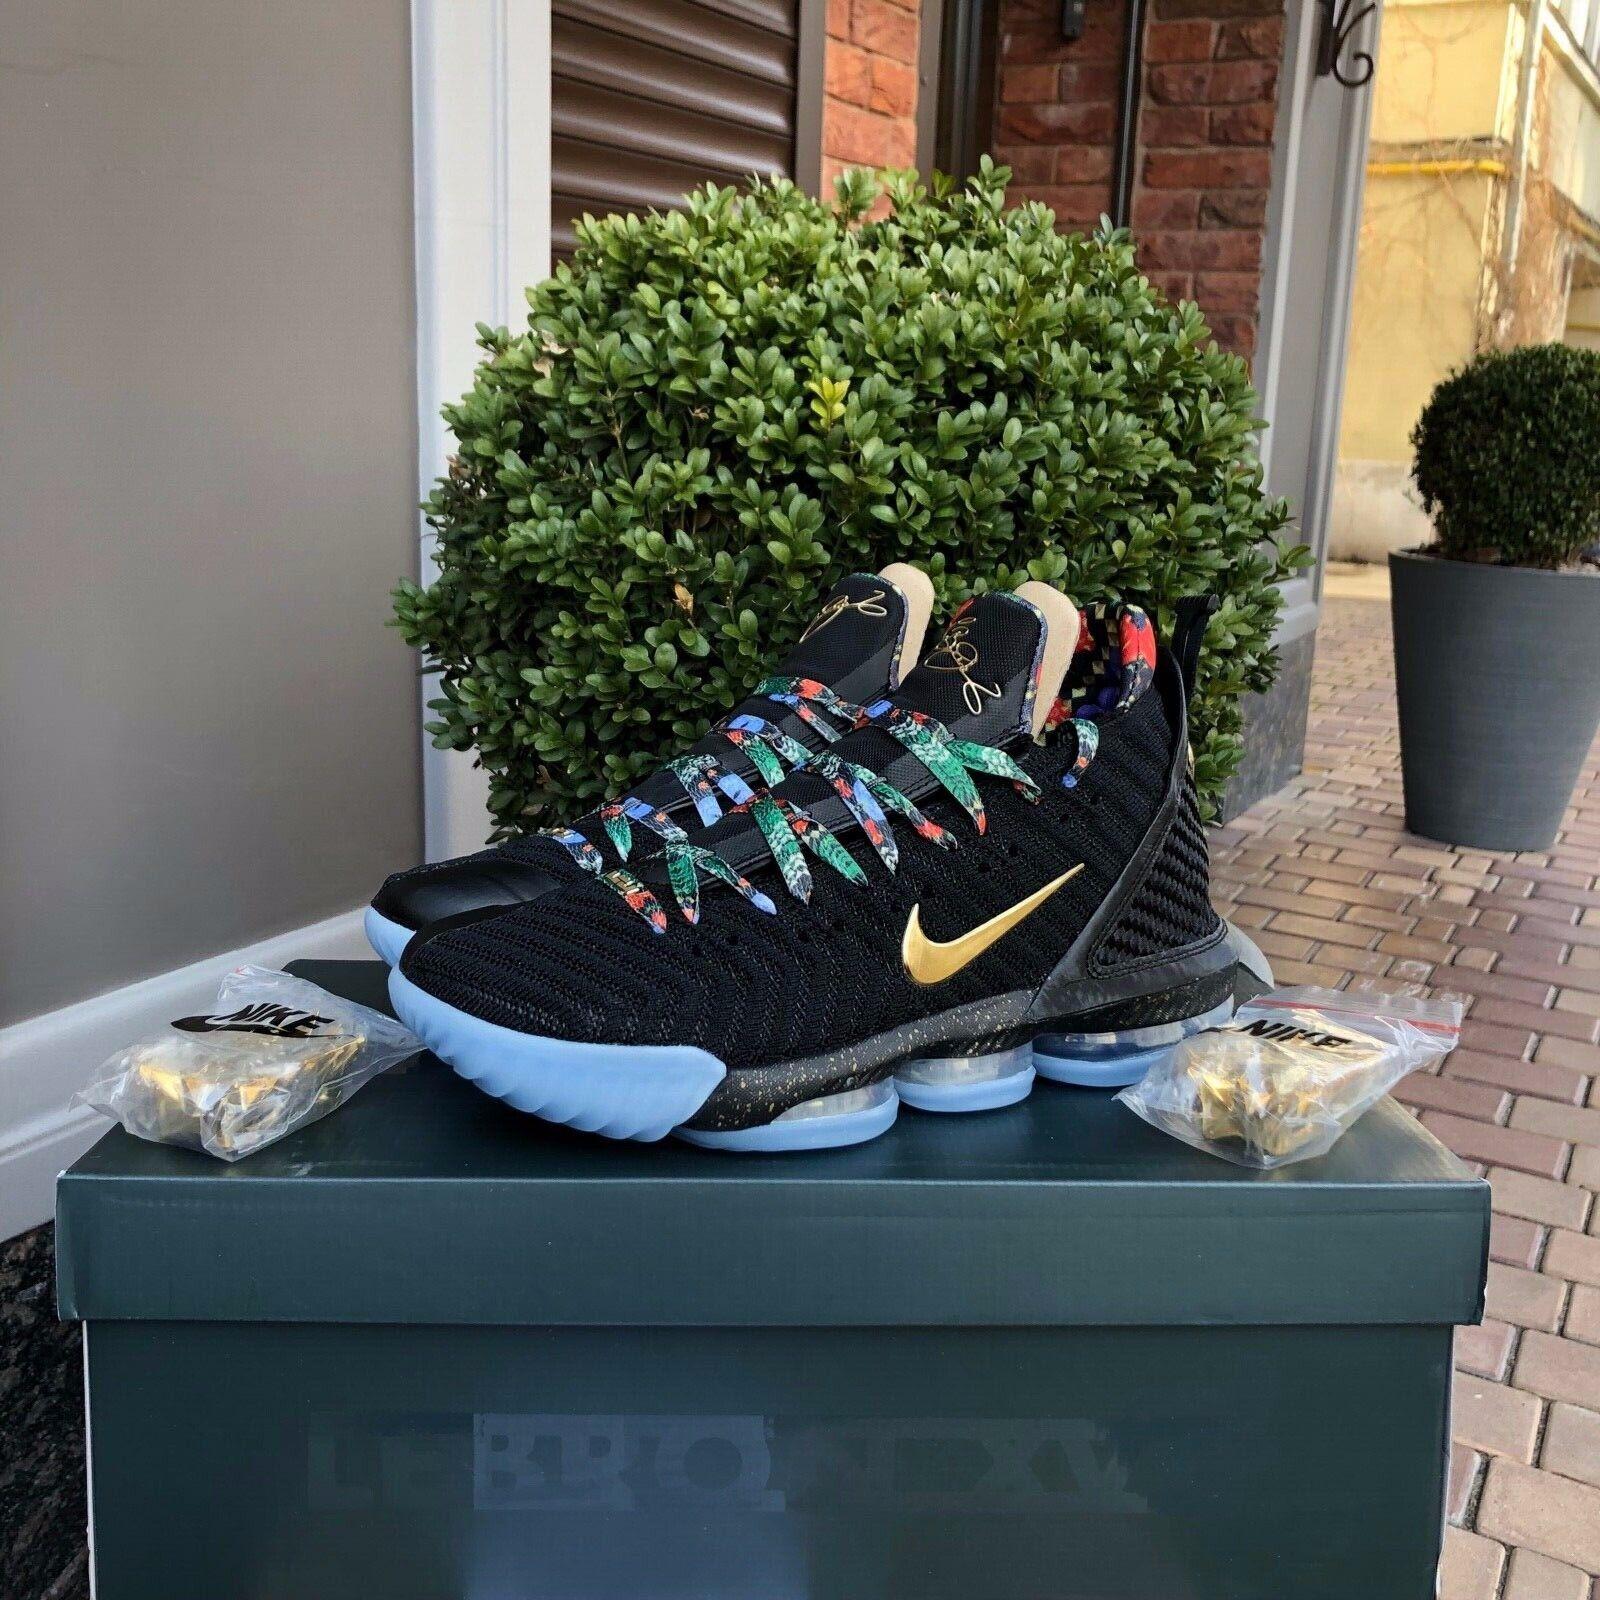 Nike Lebron XVI 16 KC  regarder THE THRONE  or Noir Rose All Star Hommes CI1518-001